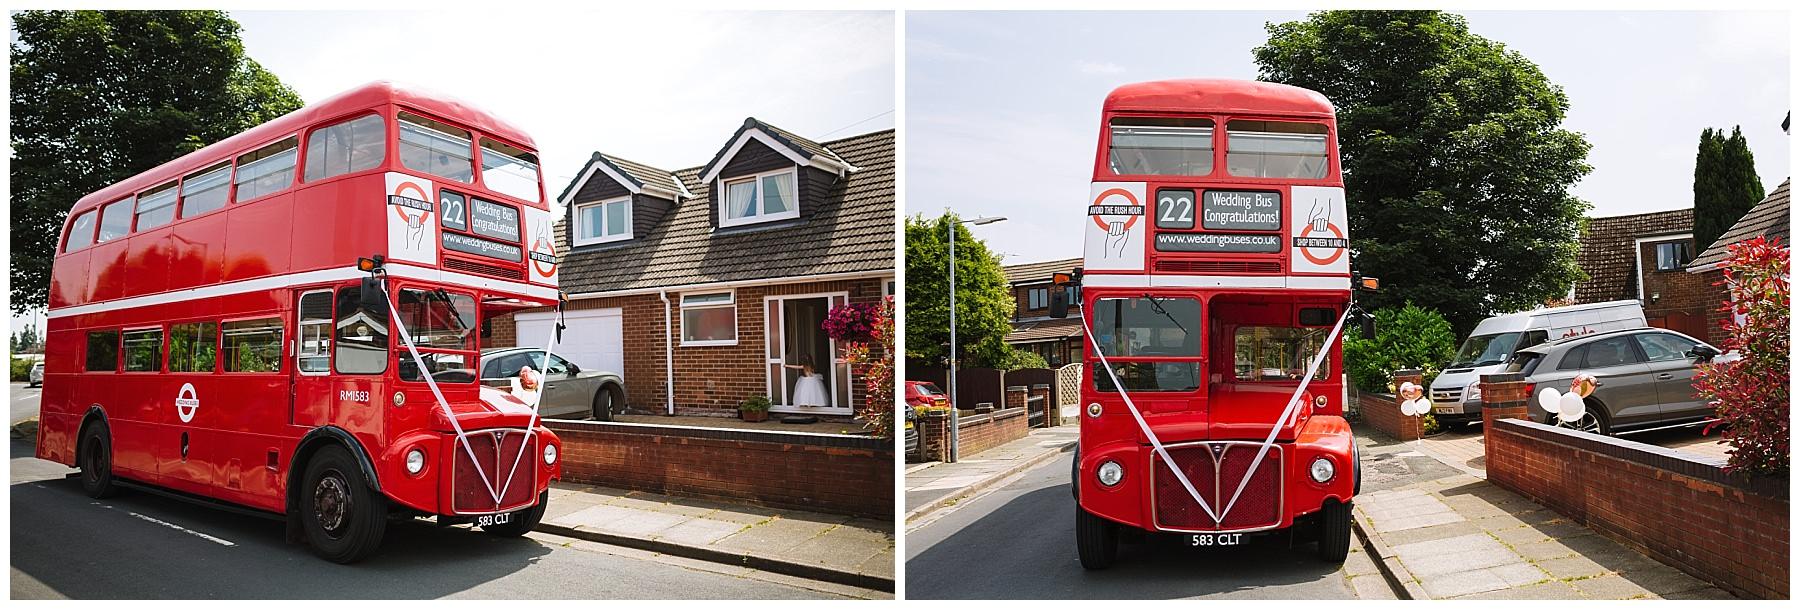 Retro red double decker bus wedding transport